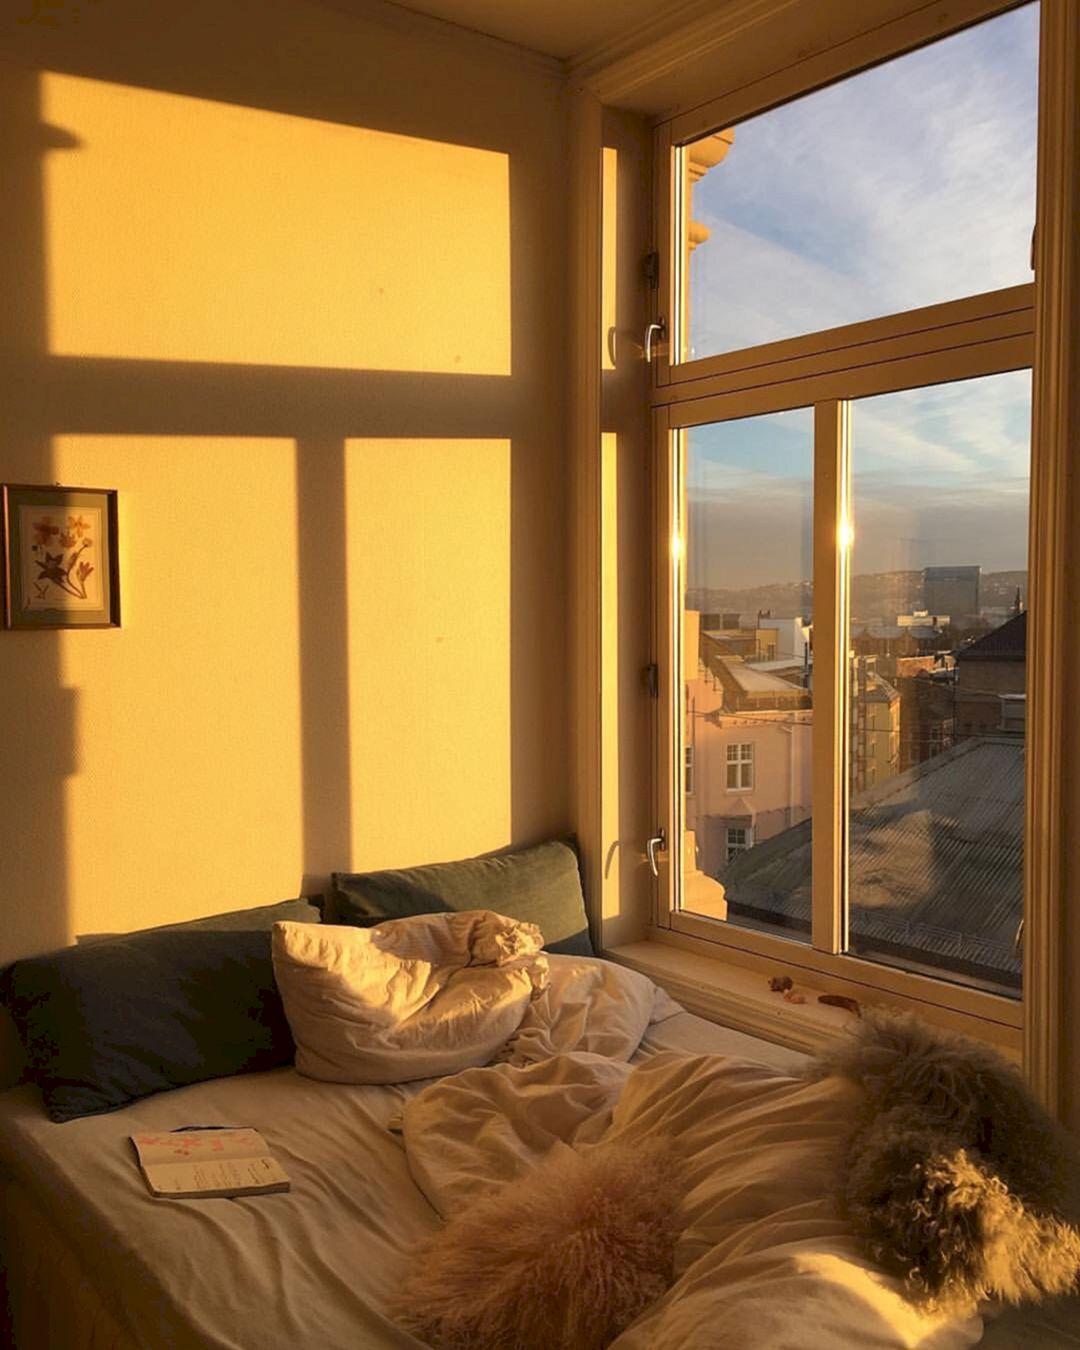 Incredible Yellow Aesthetic Bedroom Decorating Ideas 38 ... on Room Decor Aesthetic id=59956